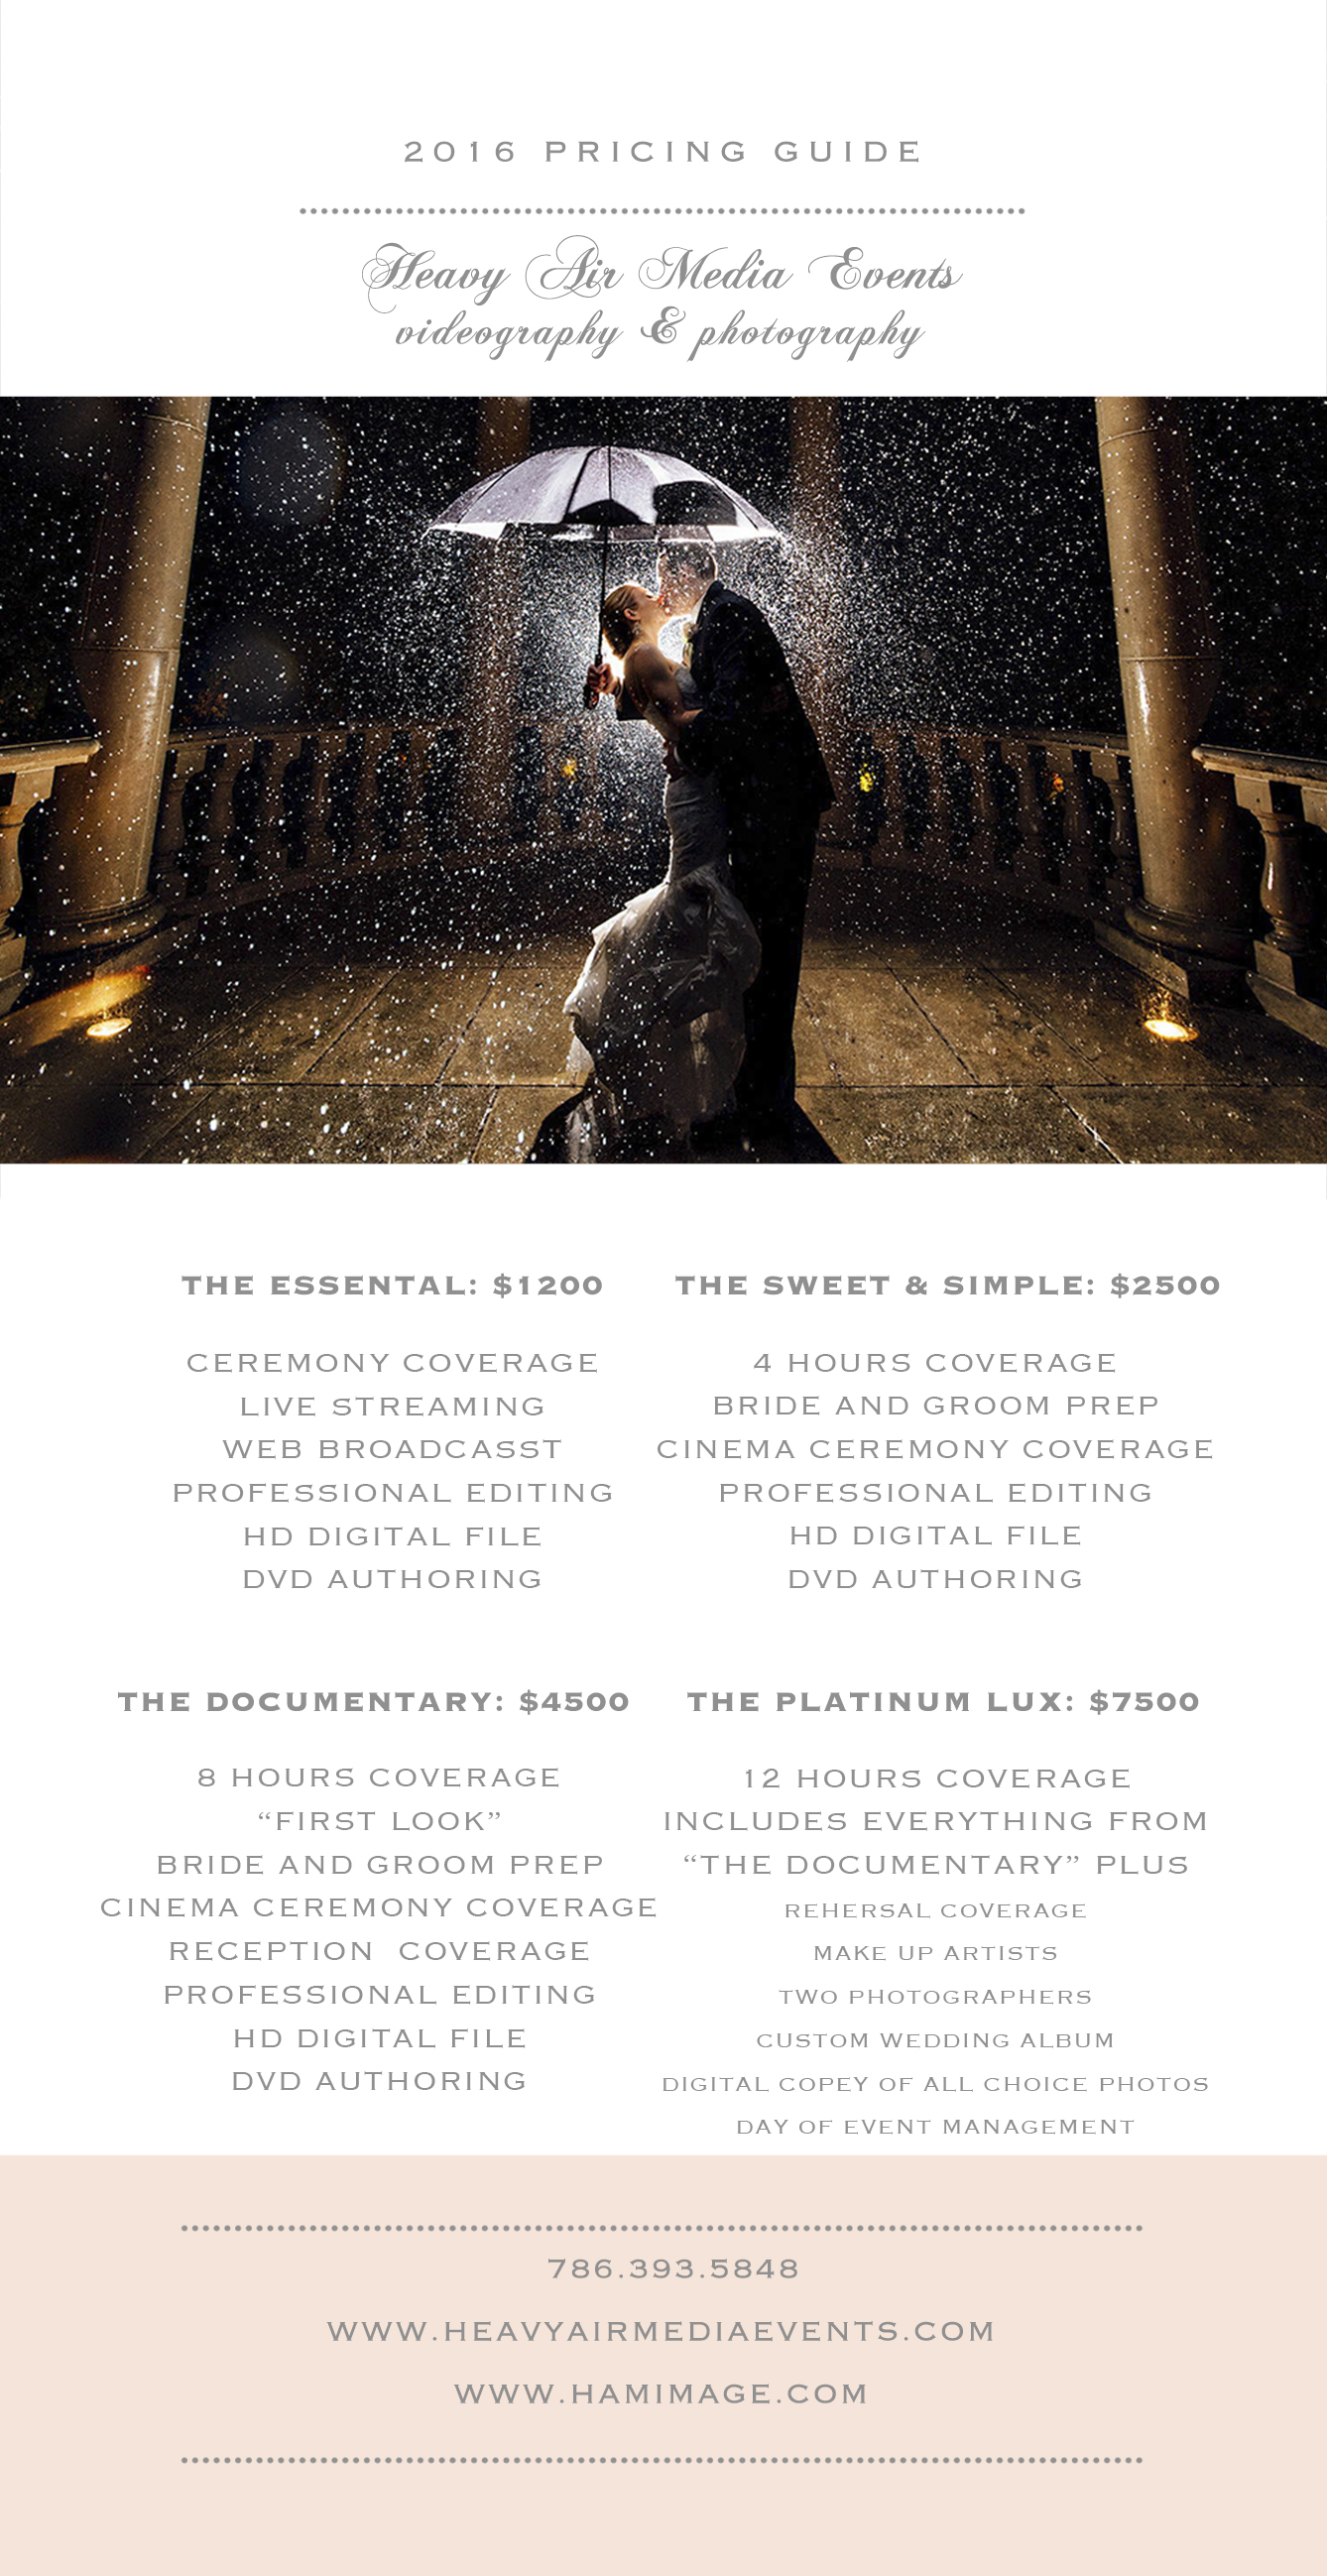 HAM Media Group - Emmy Award Winning Producer